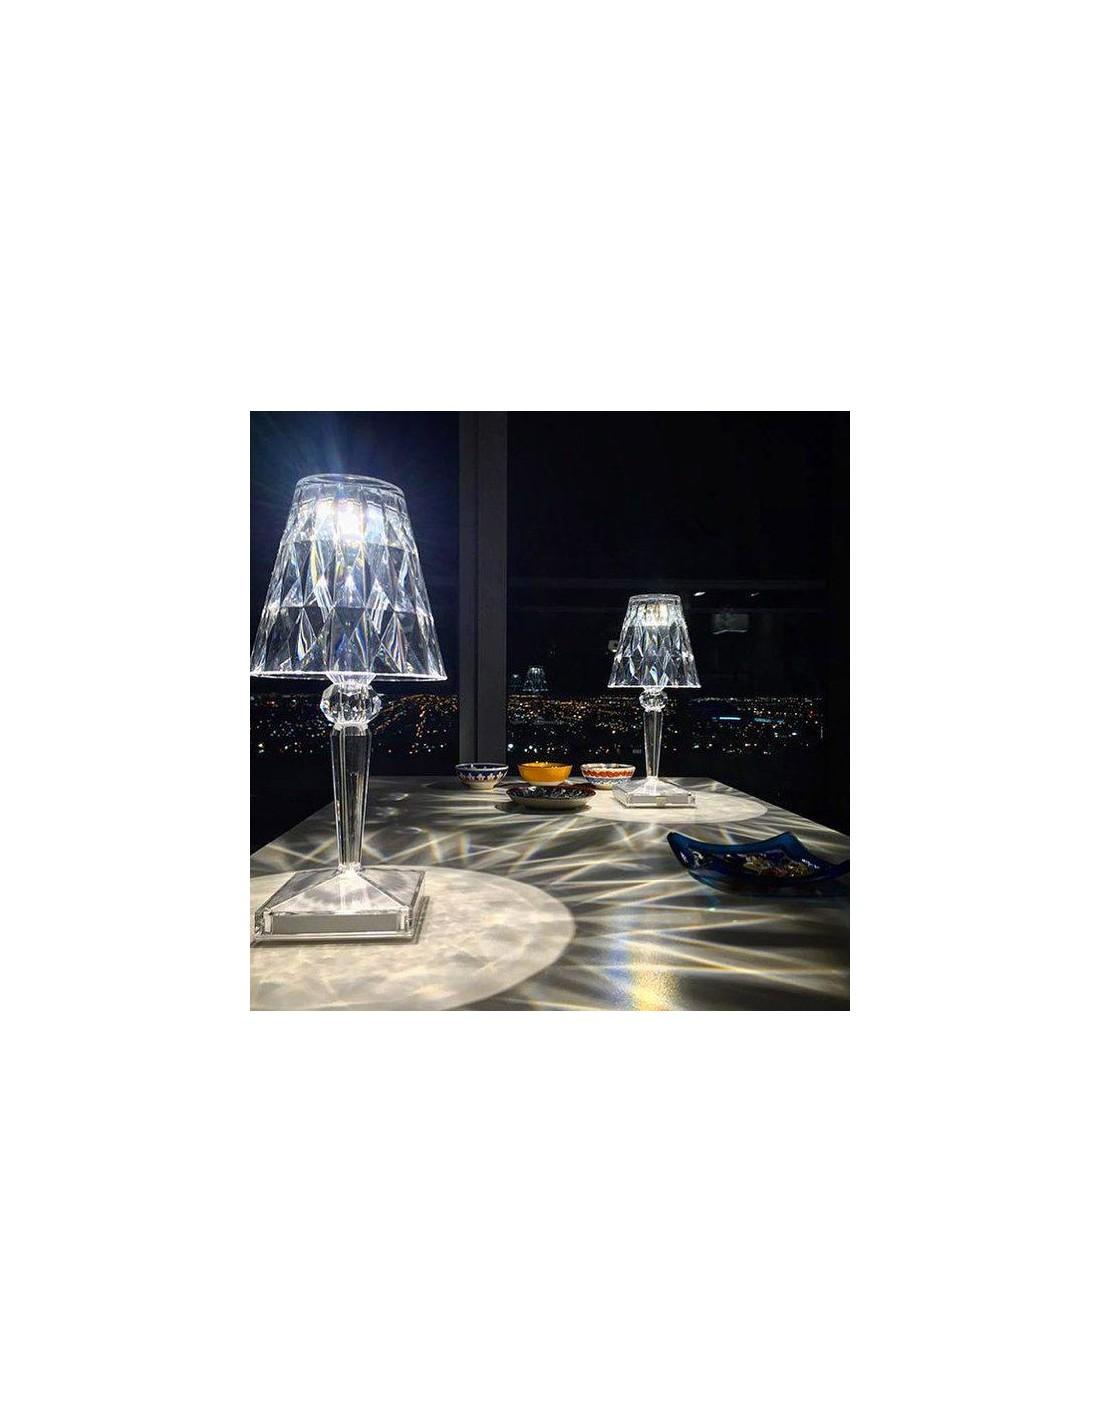 lampe de table kartell battery cristal mise en sc ne pour la marque kartell. Black Bedroom Furniture Sets. Home Design Ideas